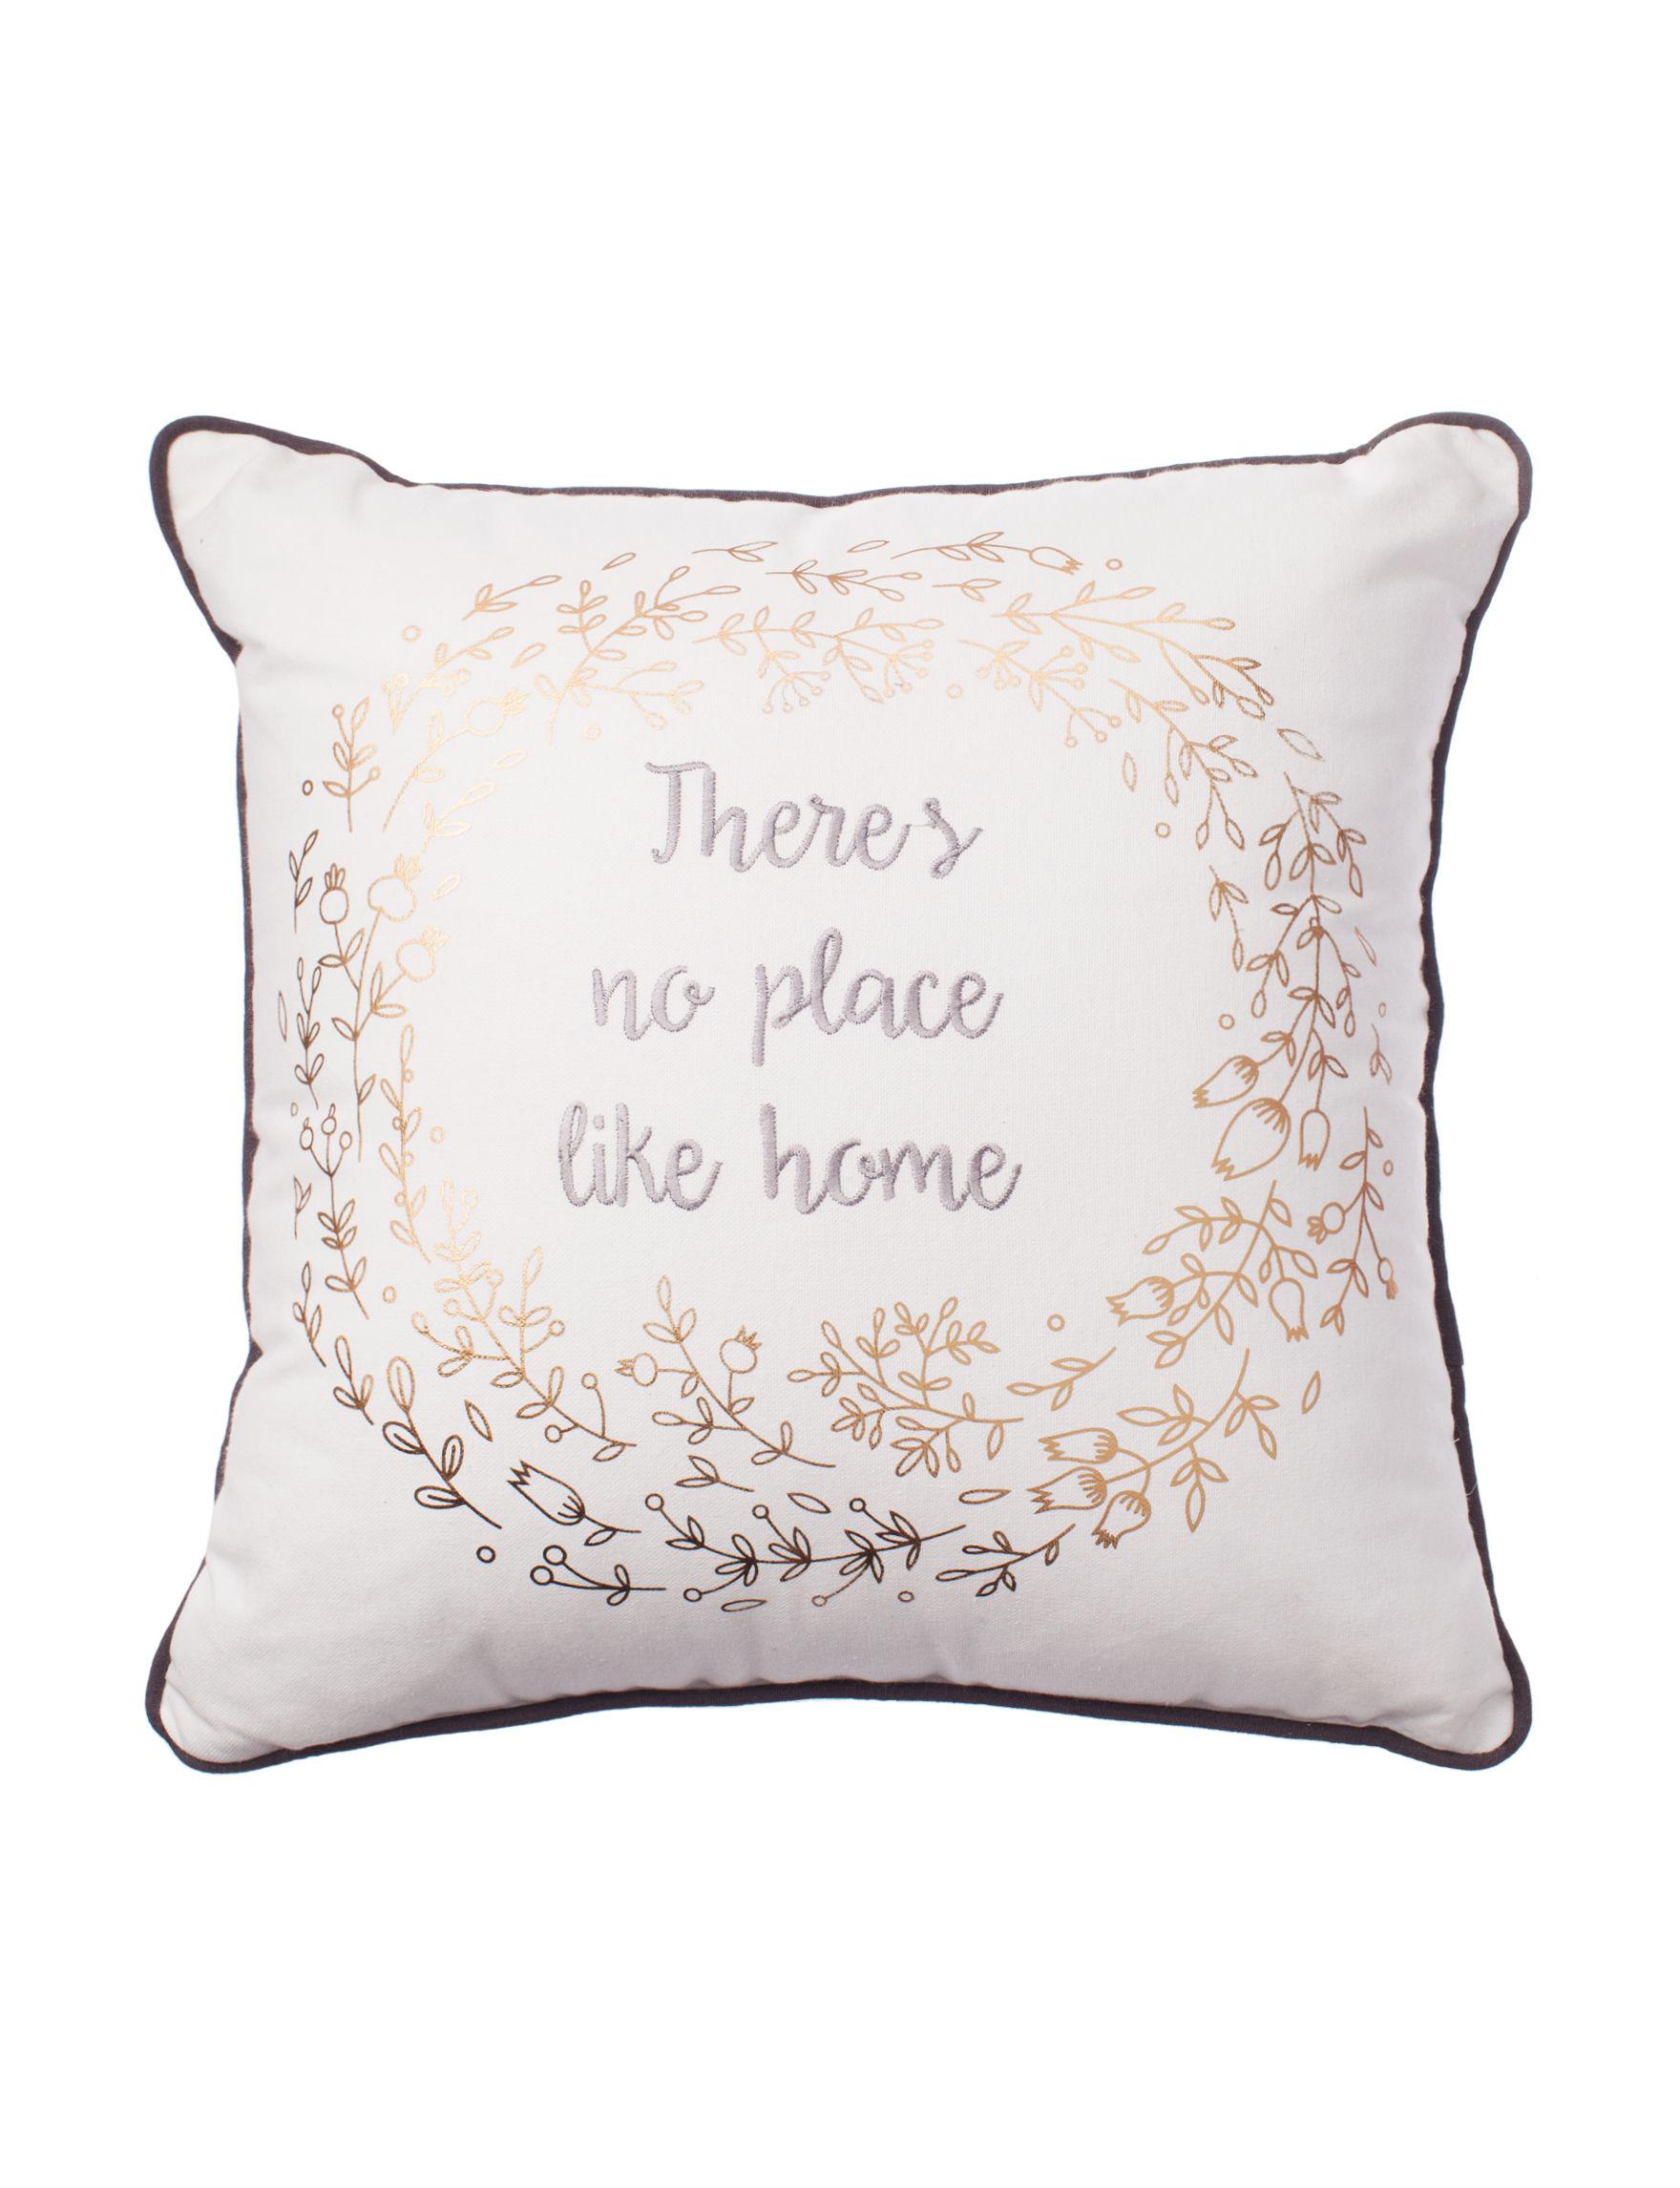 Deco White / Gold Decorative Pillows